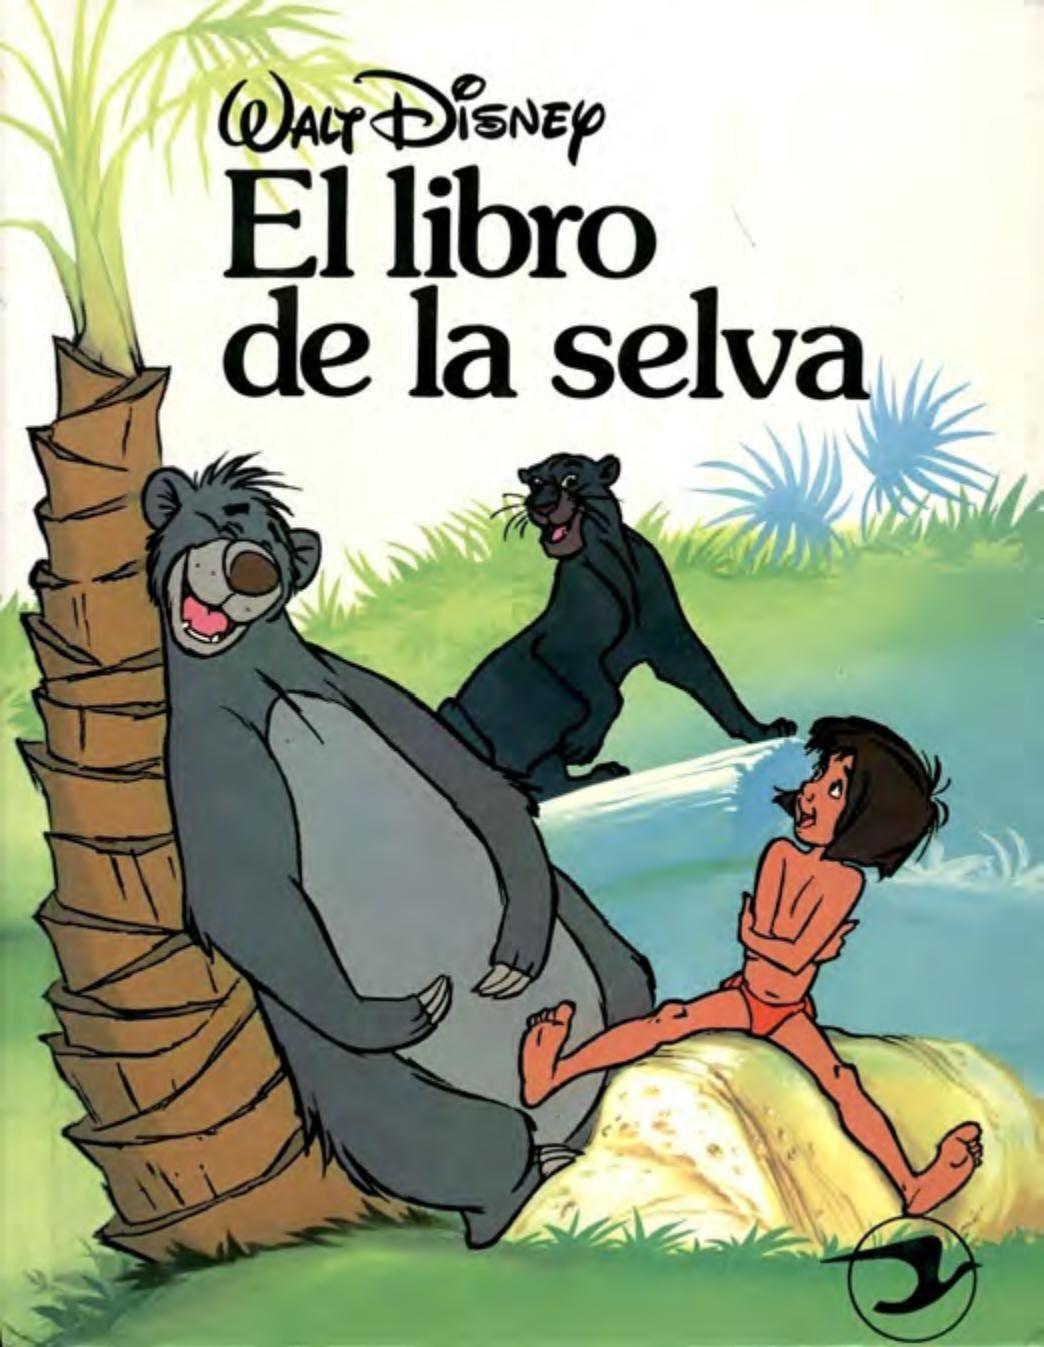 El Libro De La Selva Comic Book Cover Movies Books